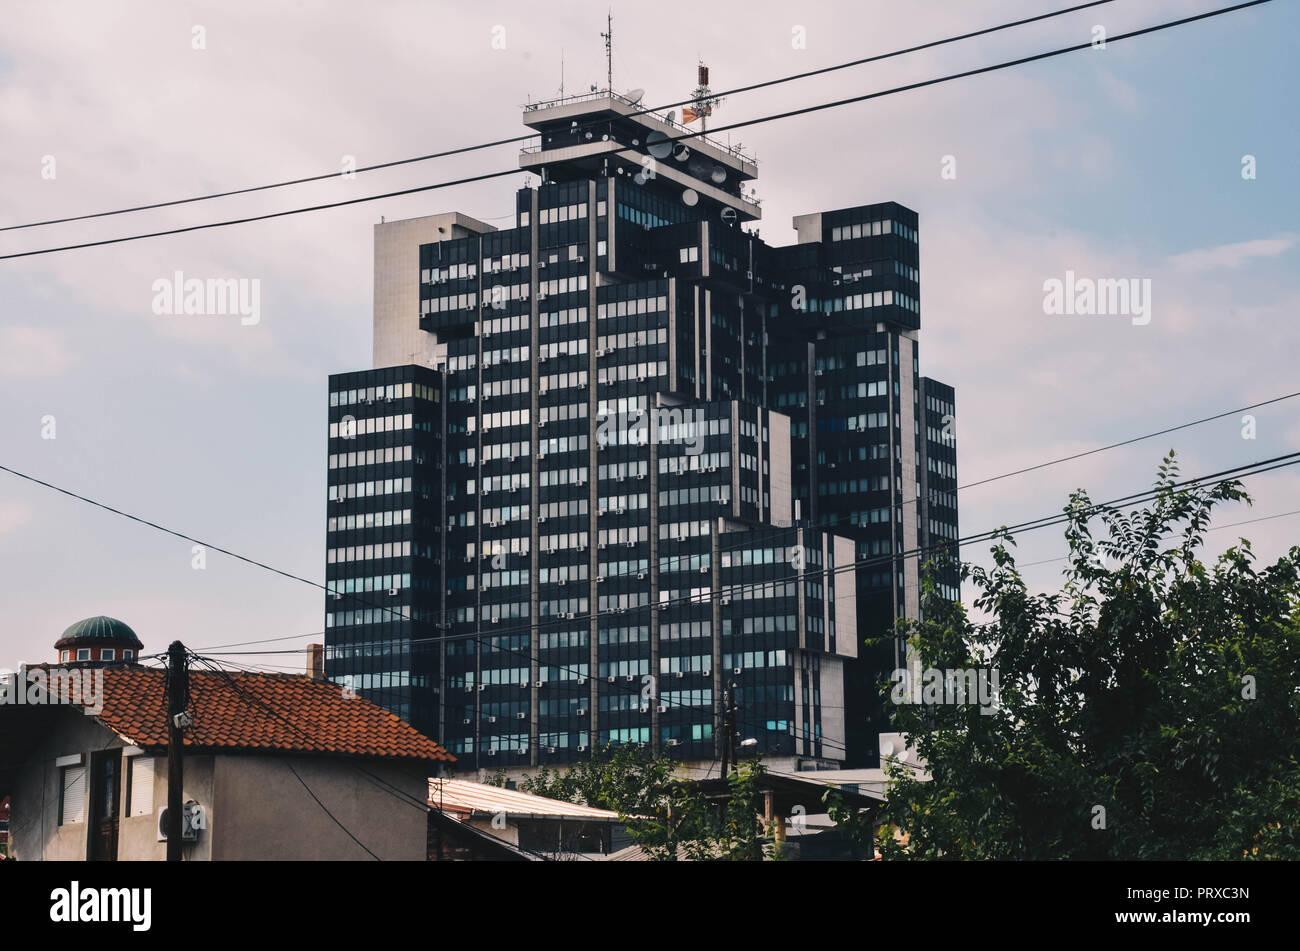 MRT Center (Macedonian Radio Television building), built in 1984, Skopje, Republic of Macedonia, September 2018 - Stock Image